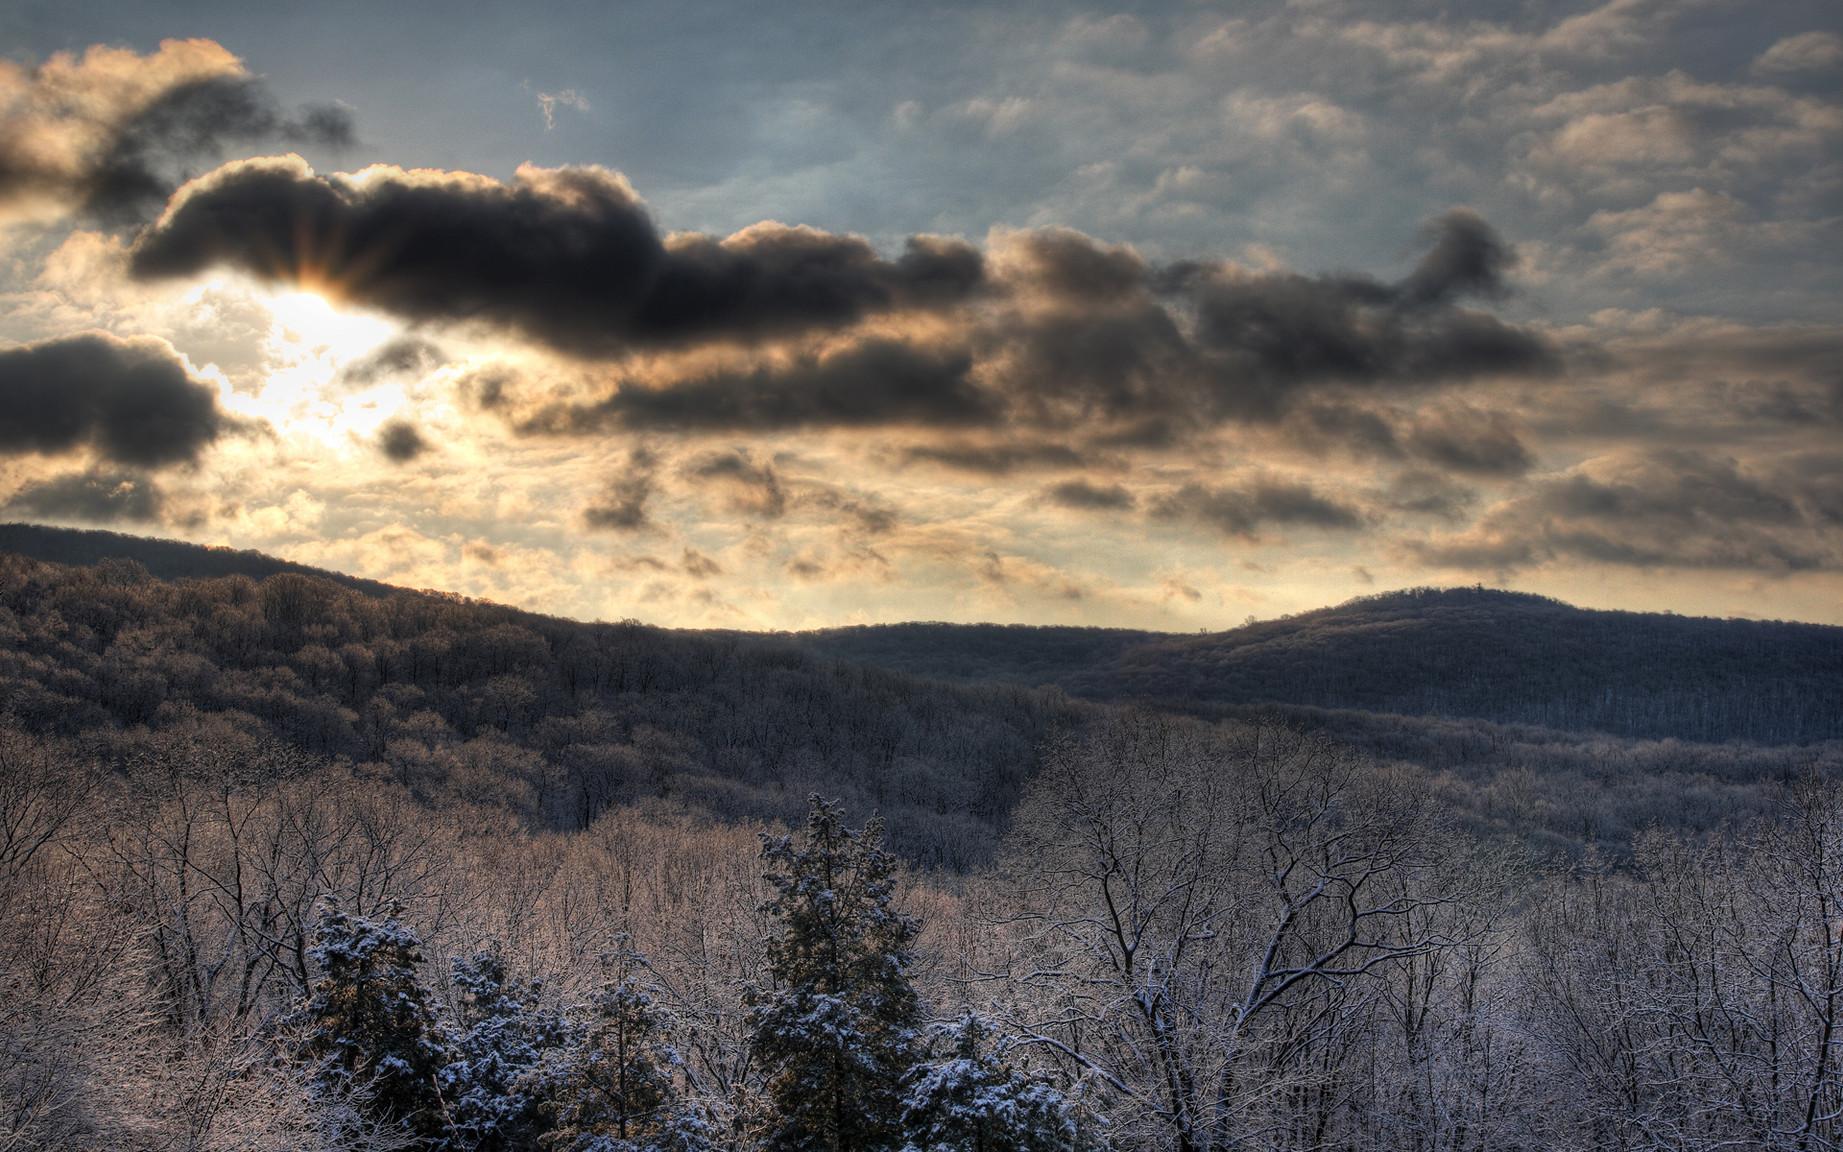 ws_Winter_Morning_1920x1200.jpg